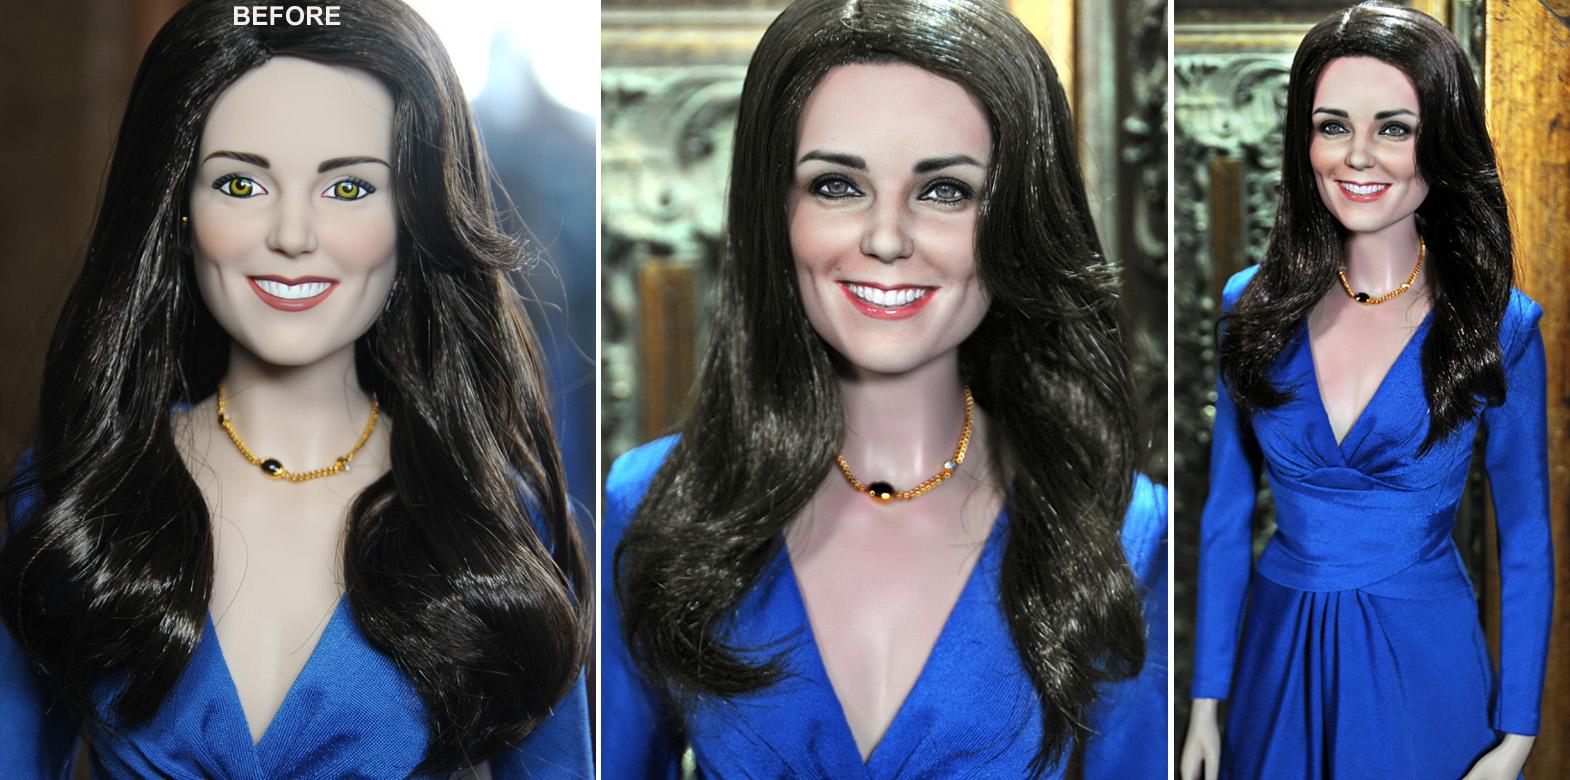 custom doll repaint Kate Middleton by noeling